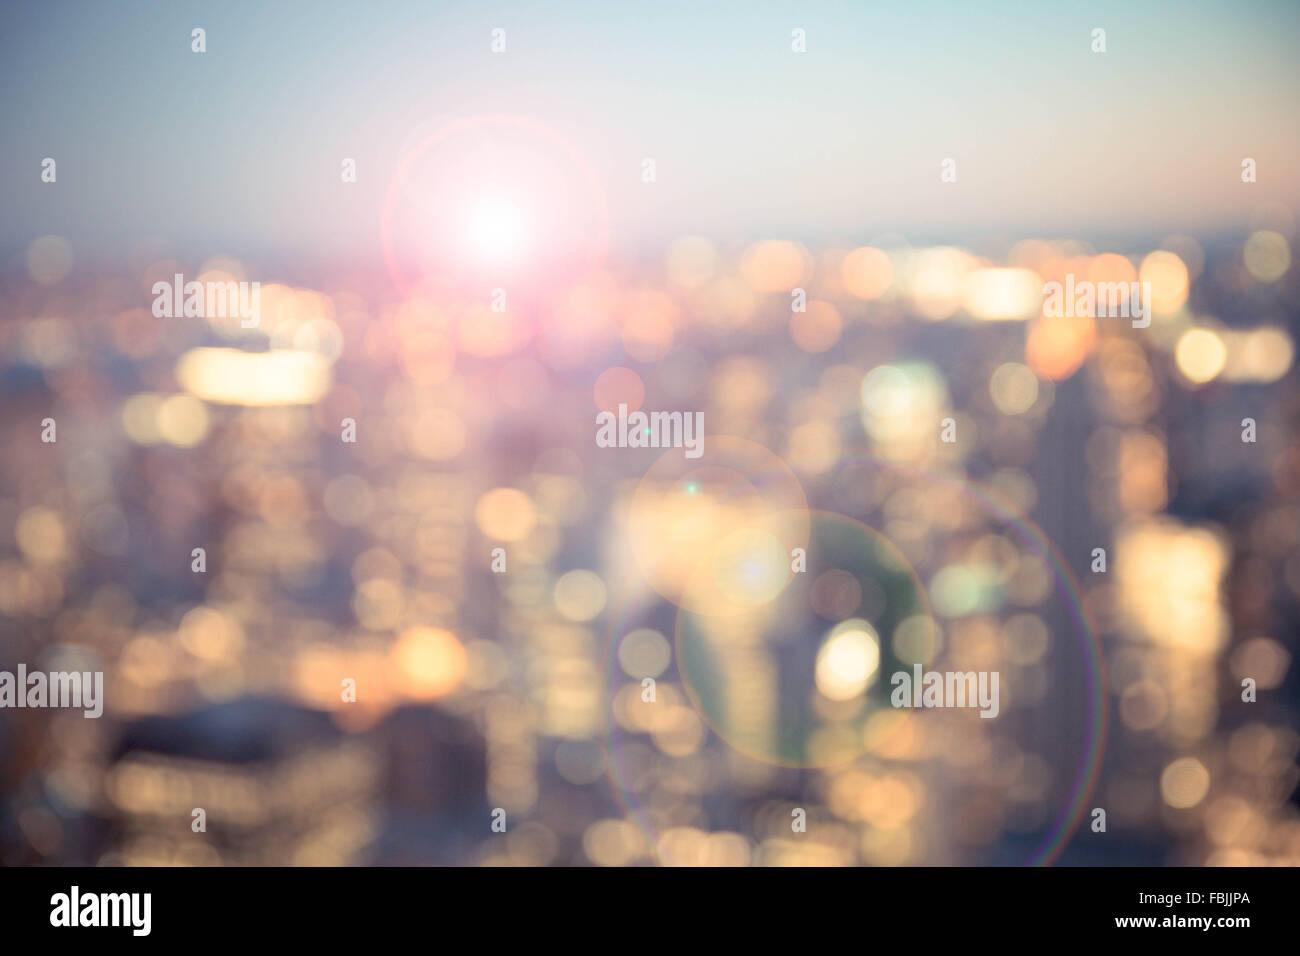 Defocused blur of New York City buildings - Stock Image